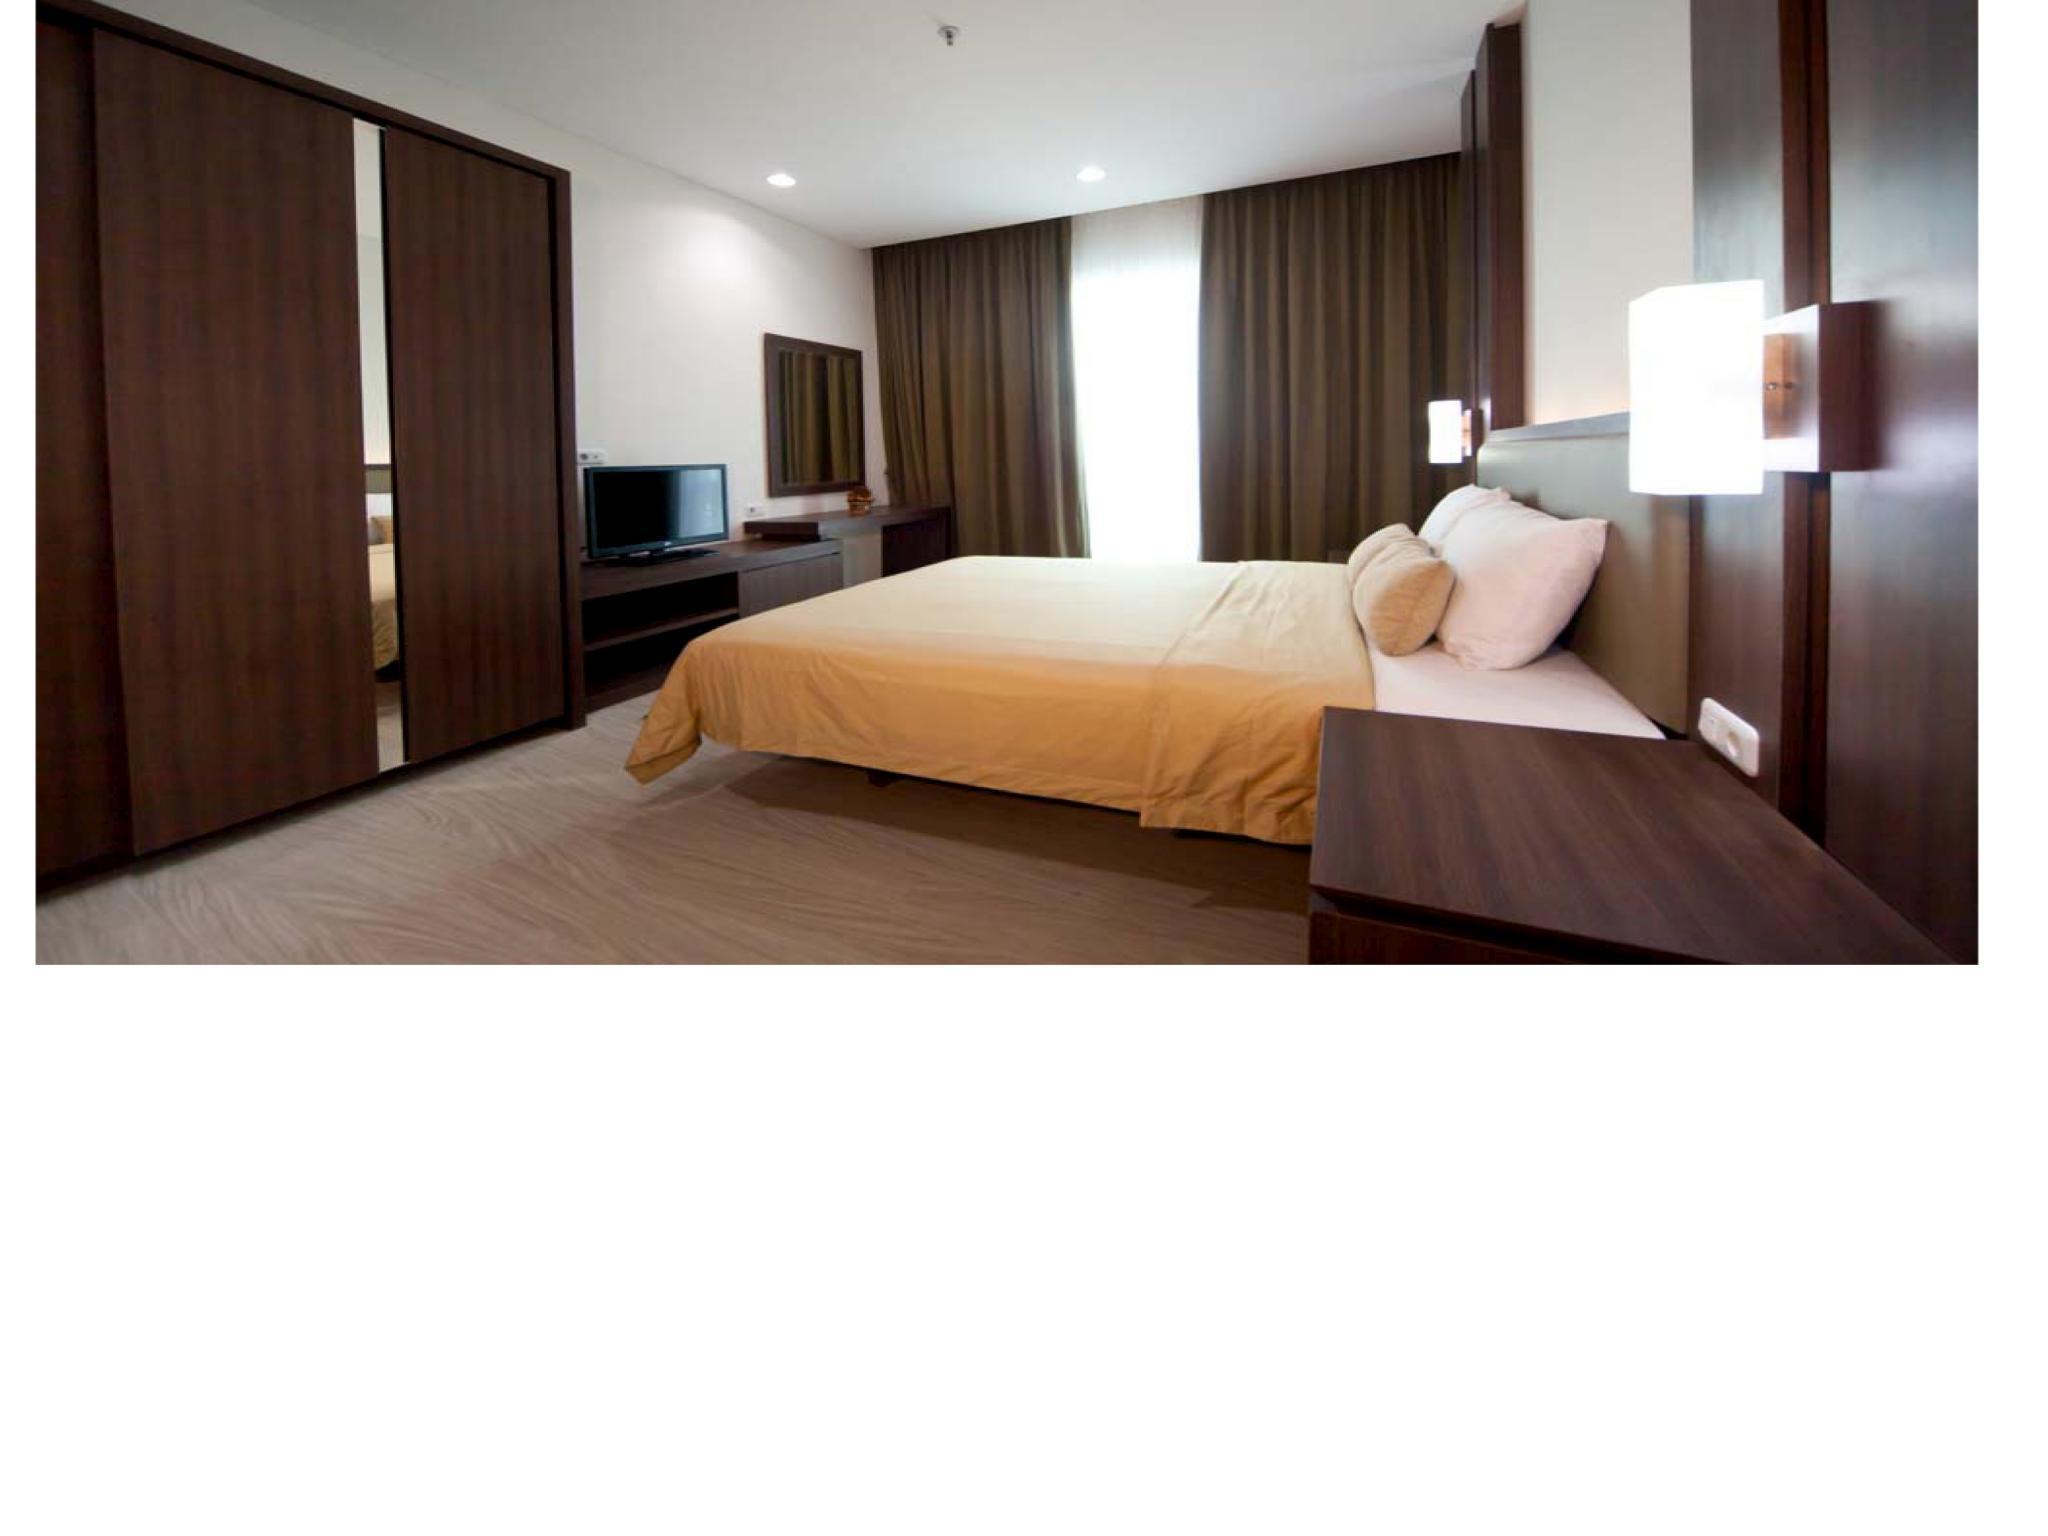 3 BR Pejaten Indah Apartment Room 04